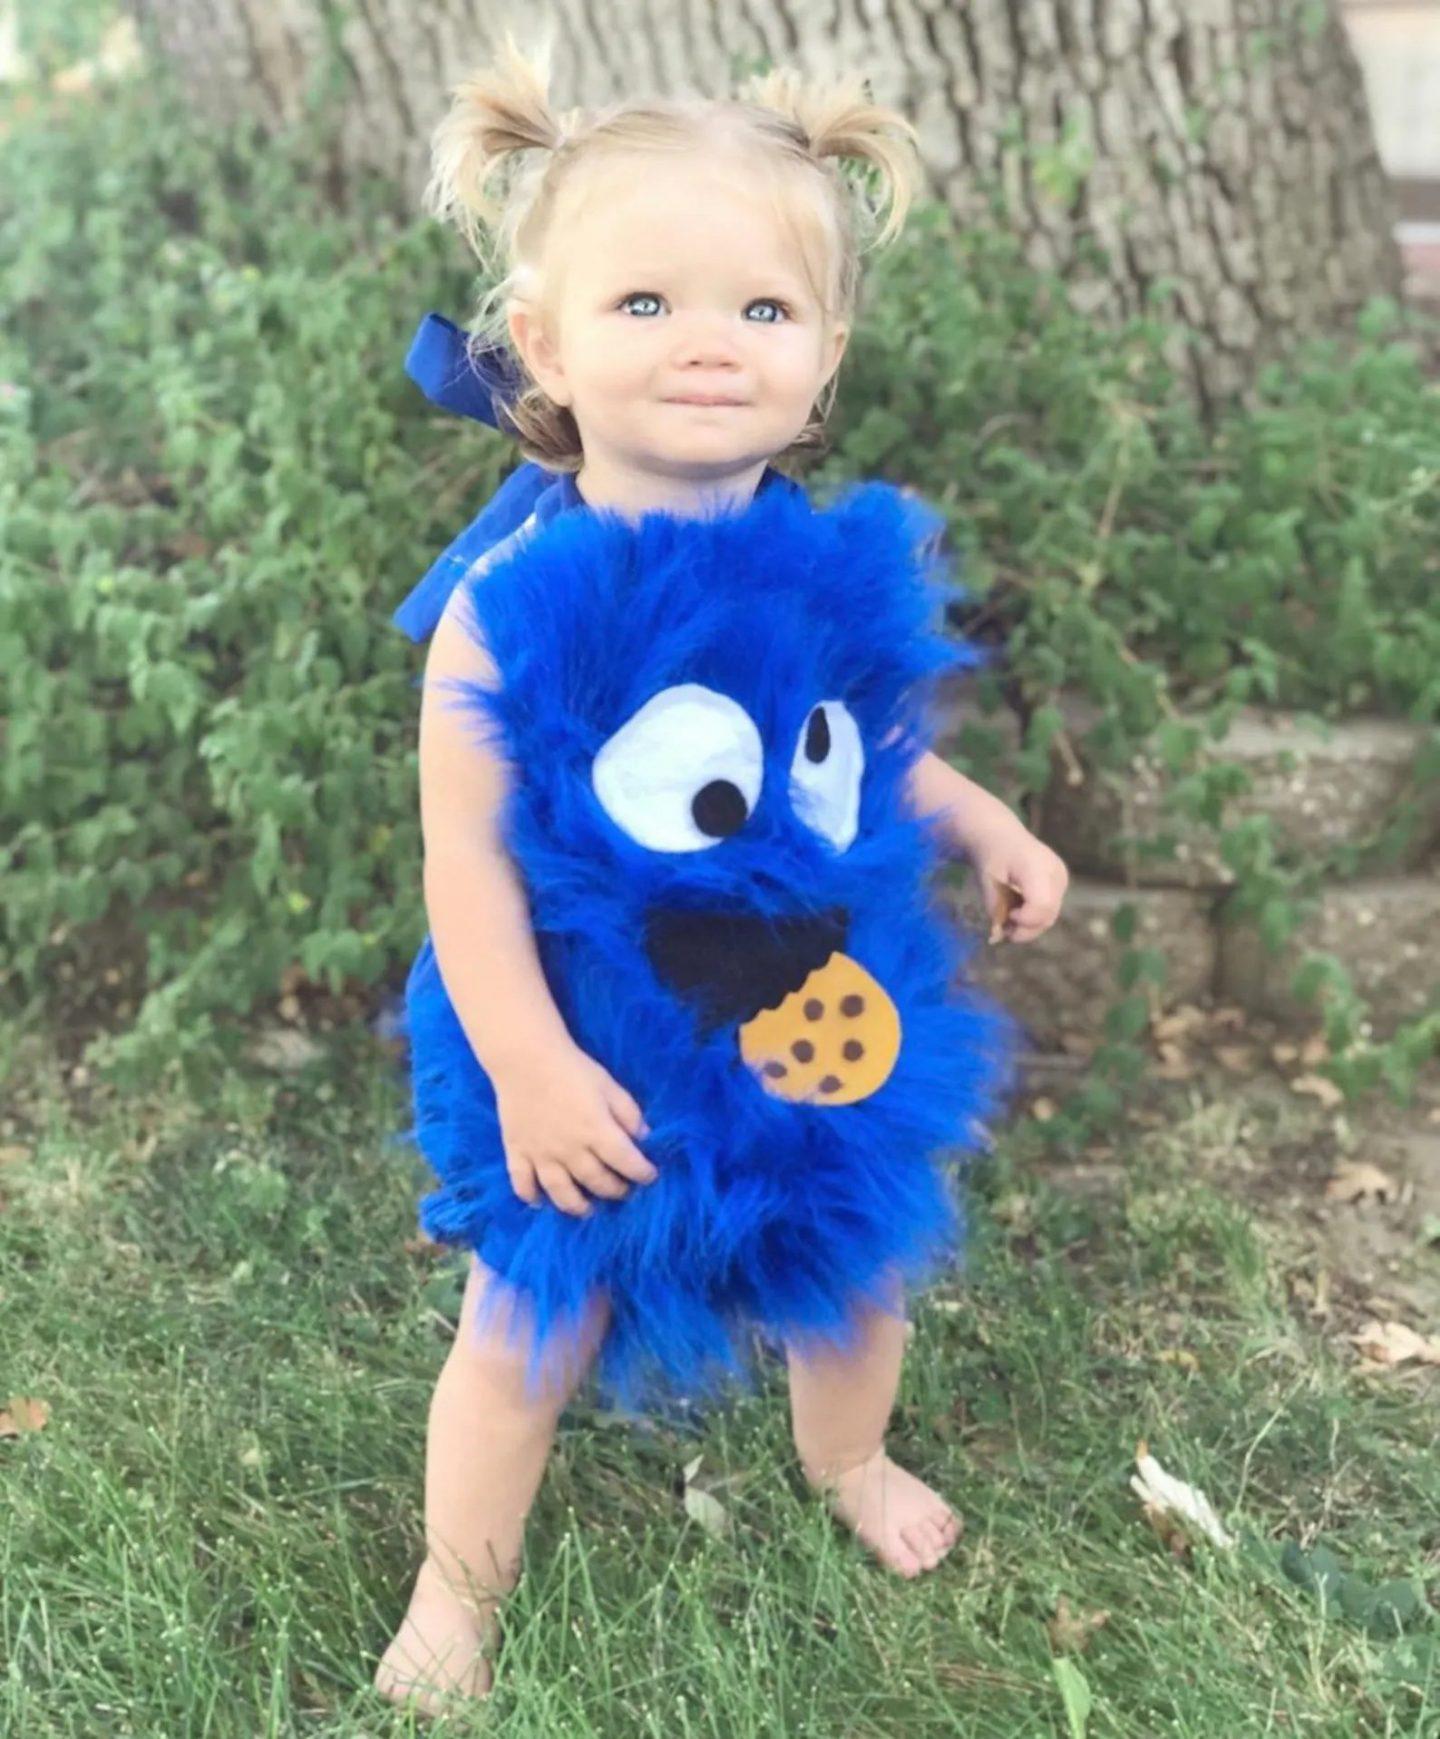 Blue cookie monster Halloween costume for babies